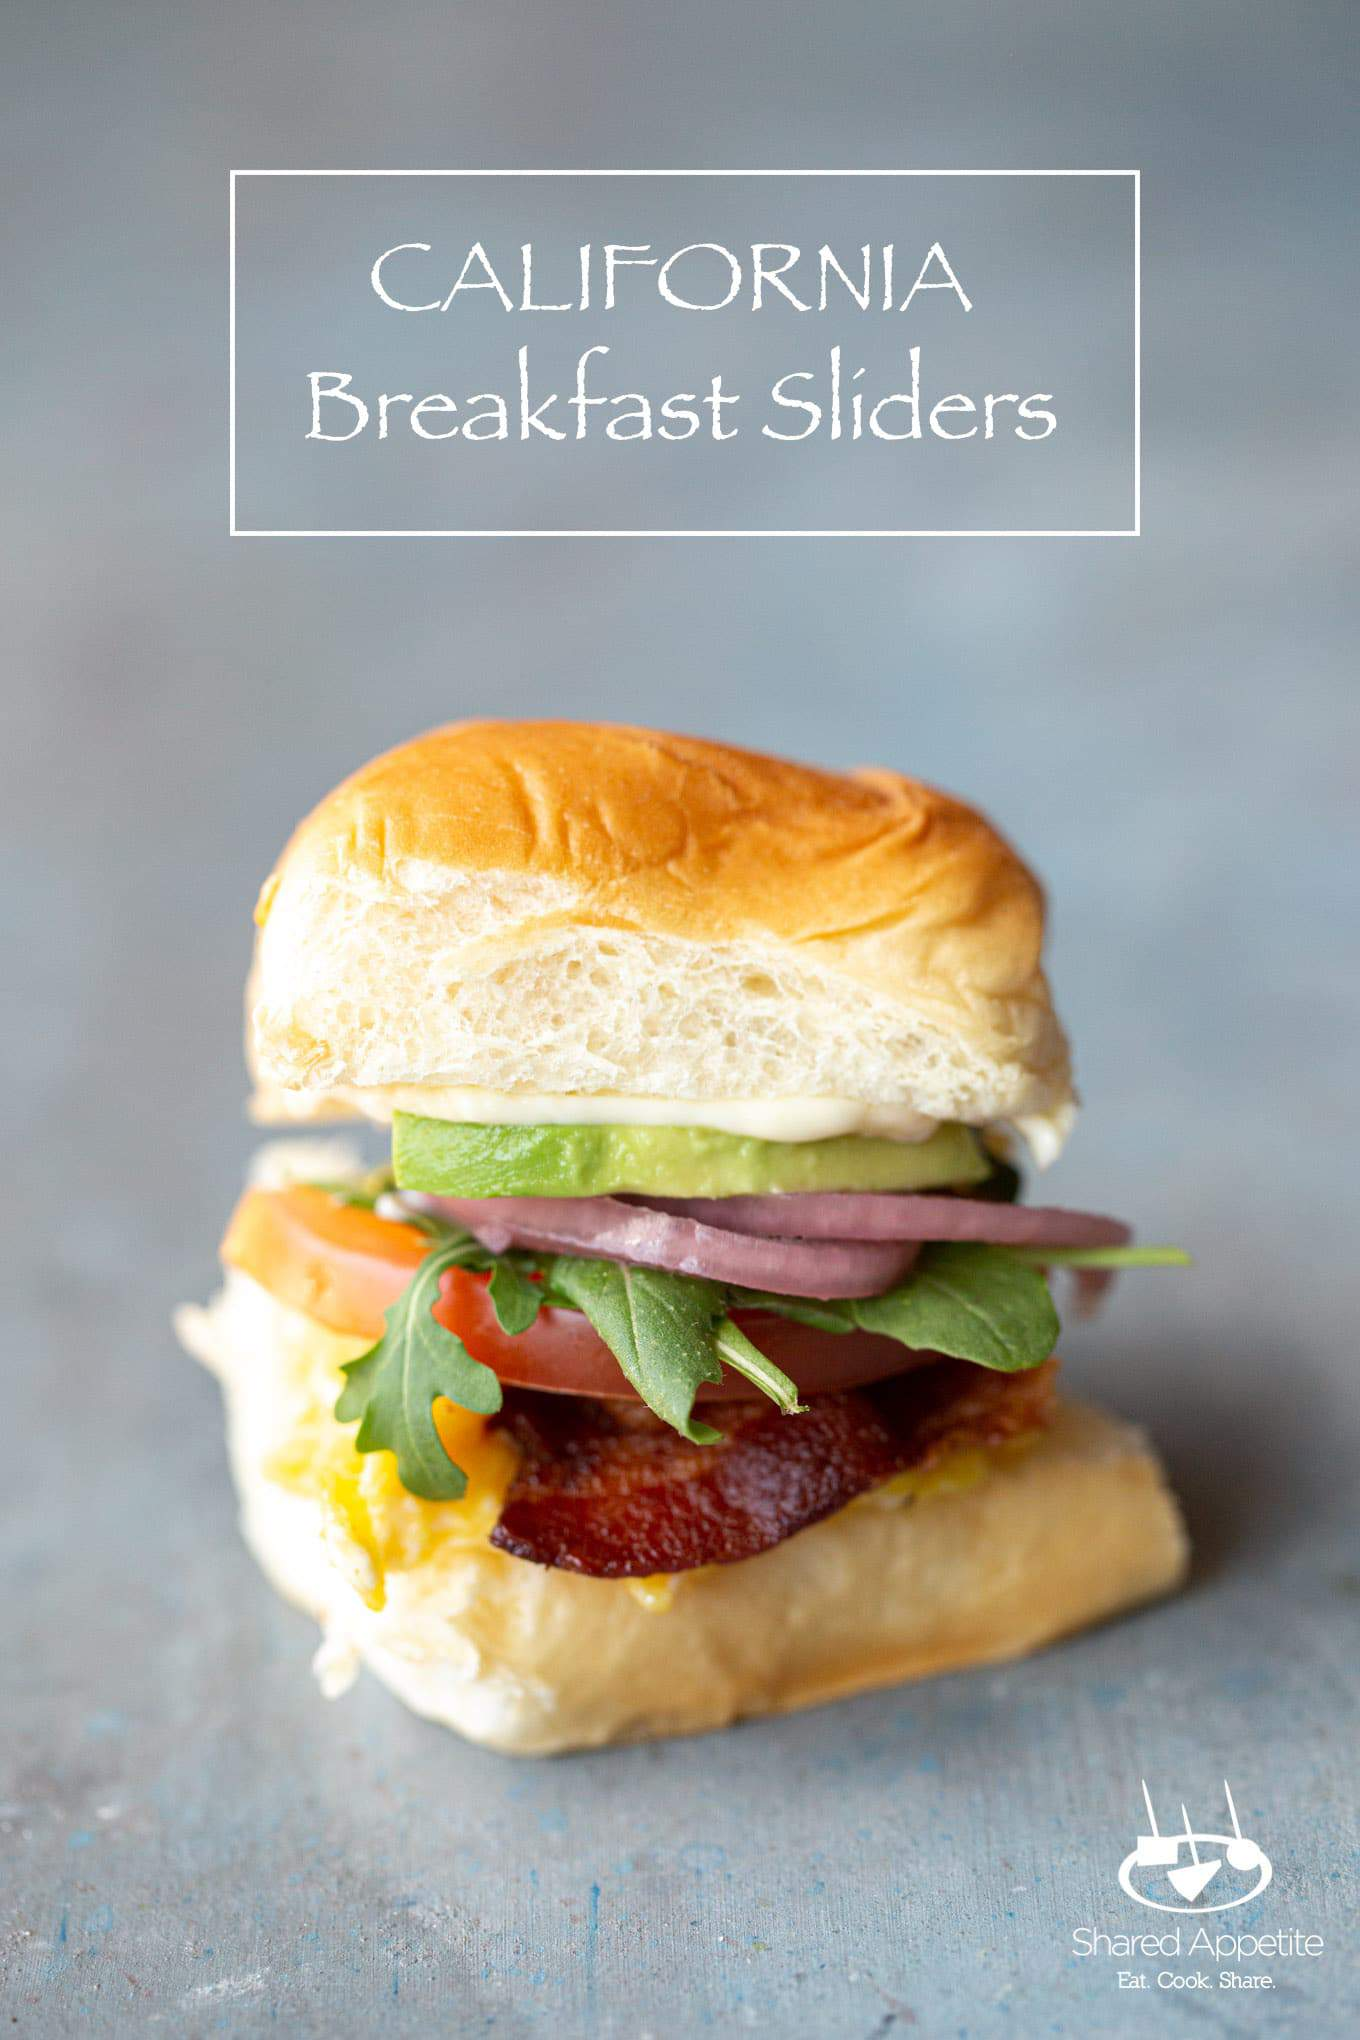 California Breakfast Sliders